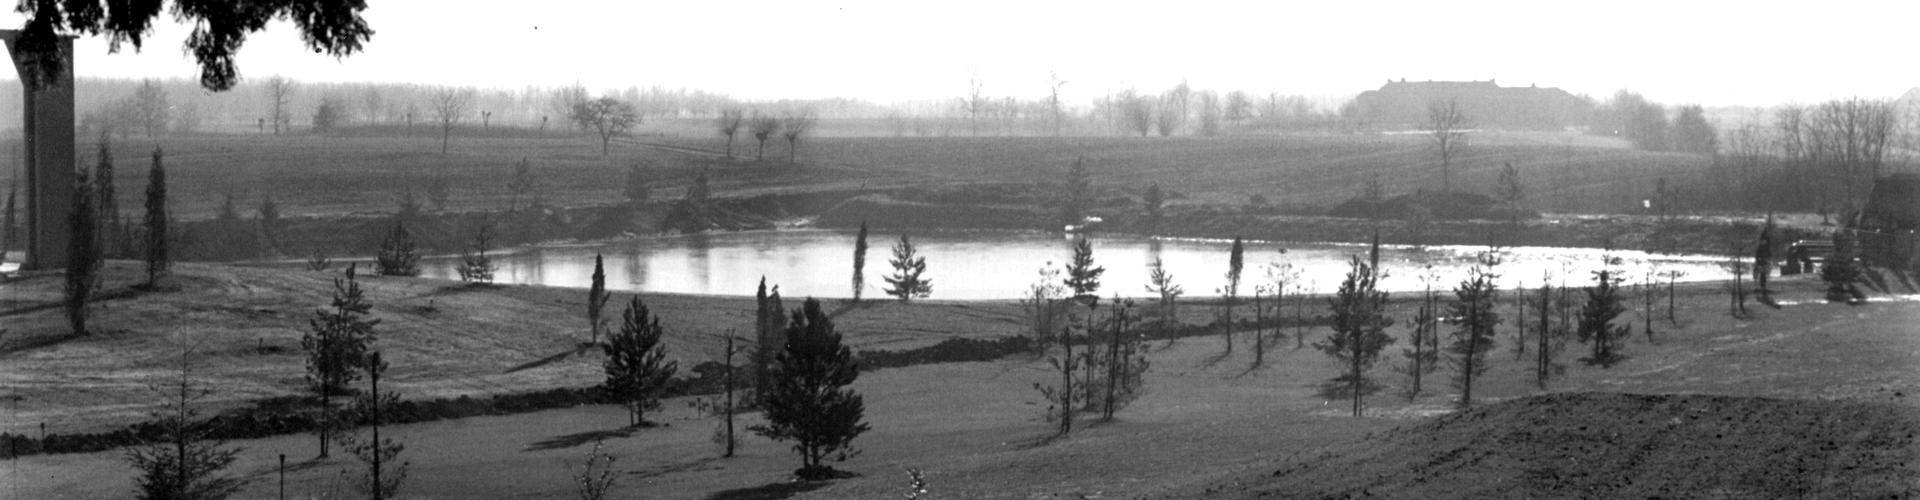 golf margara storia